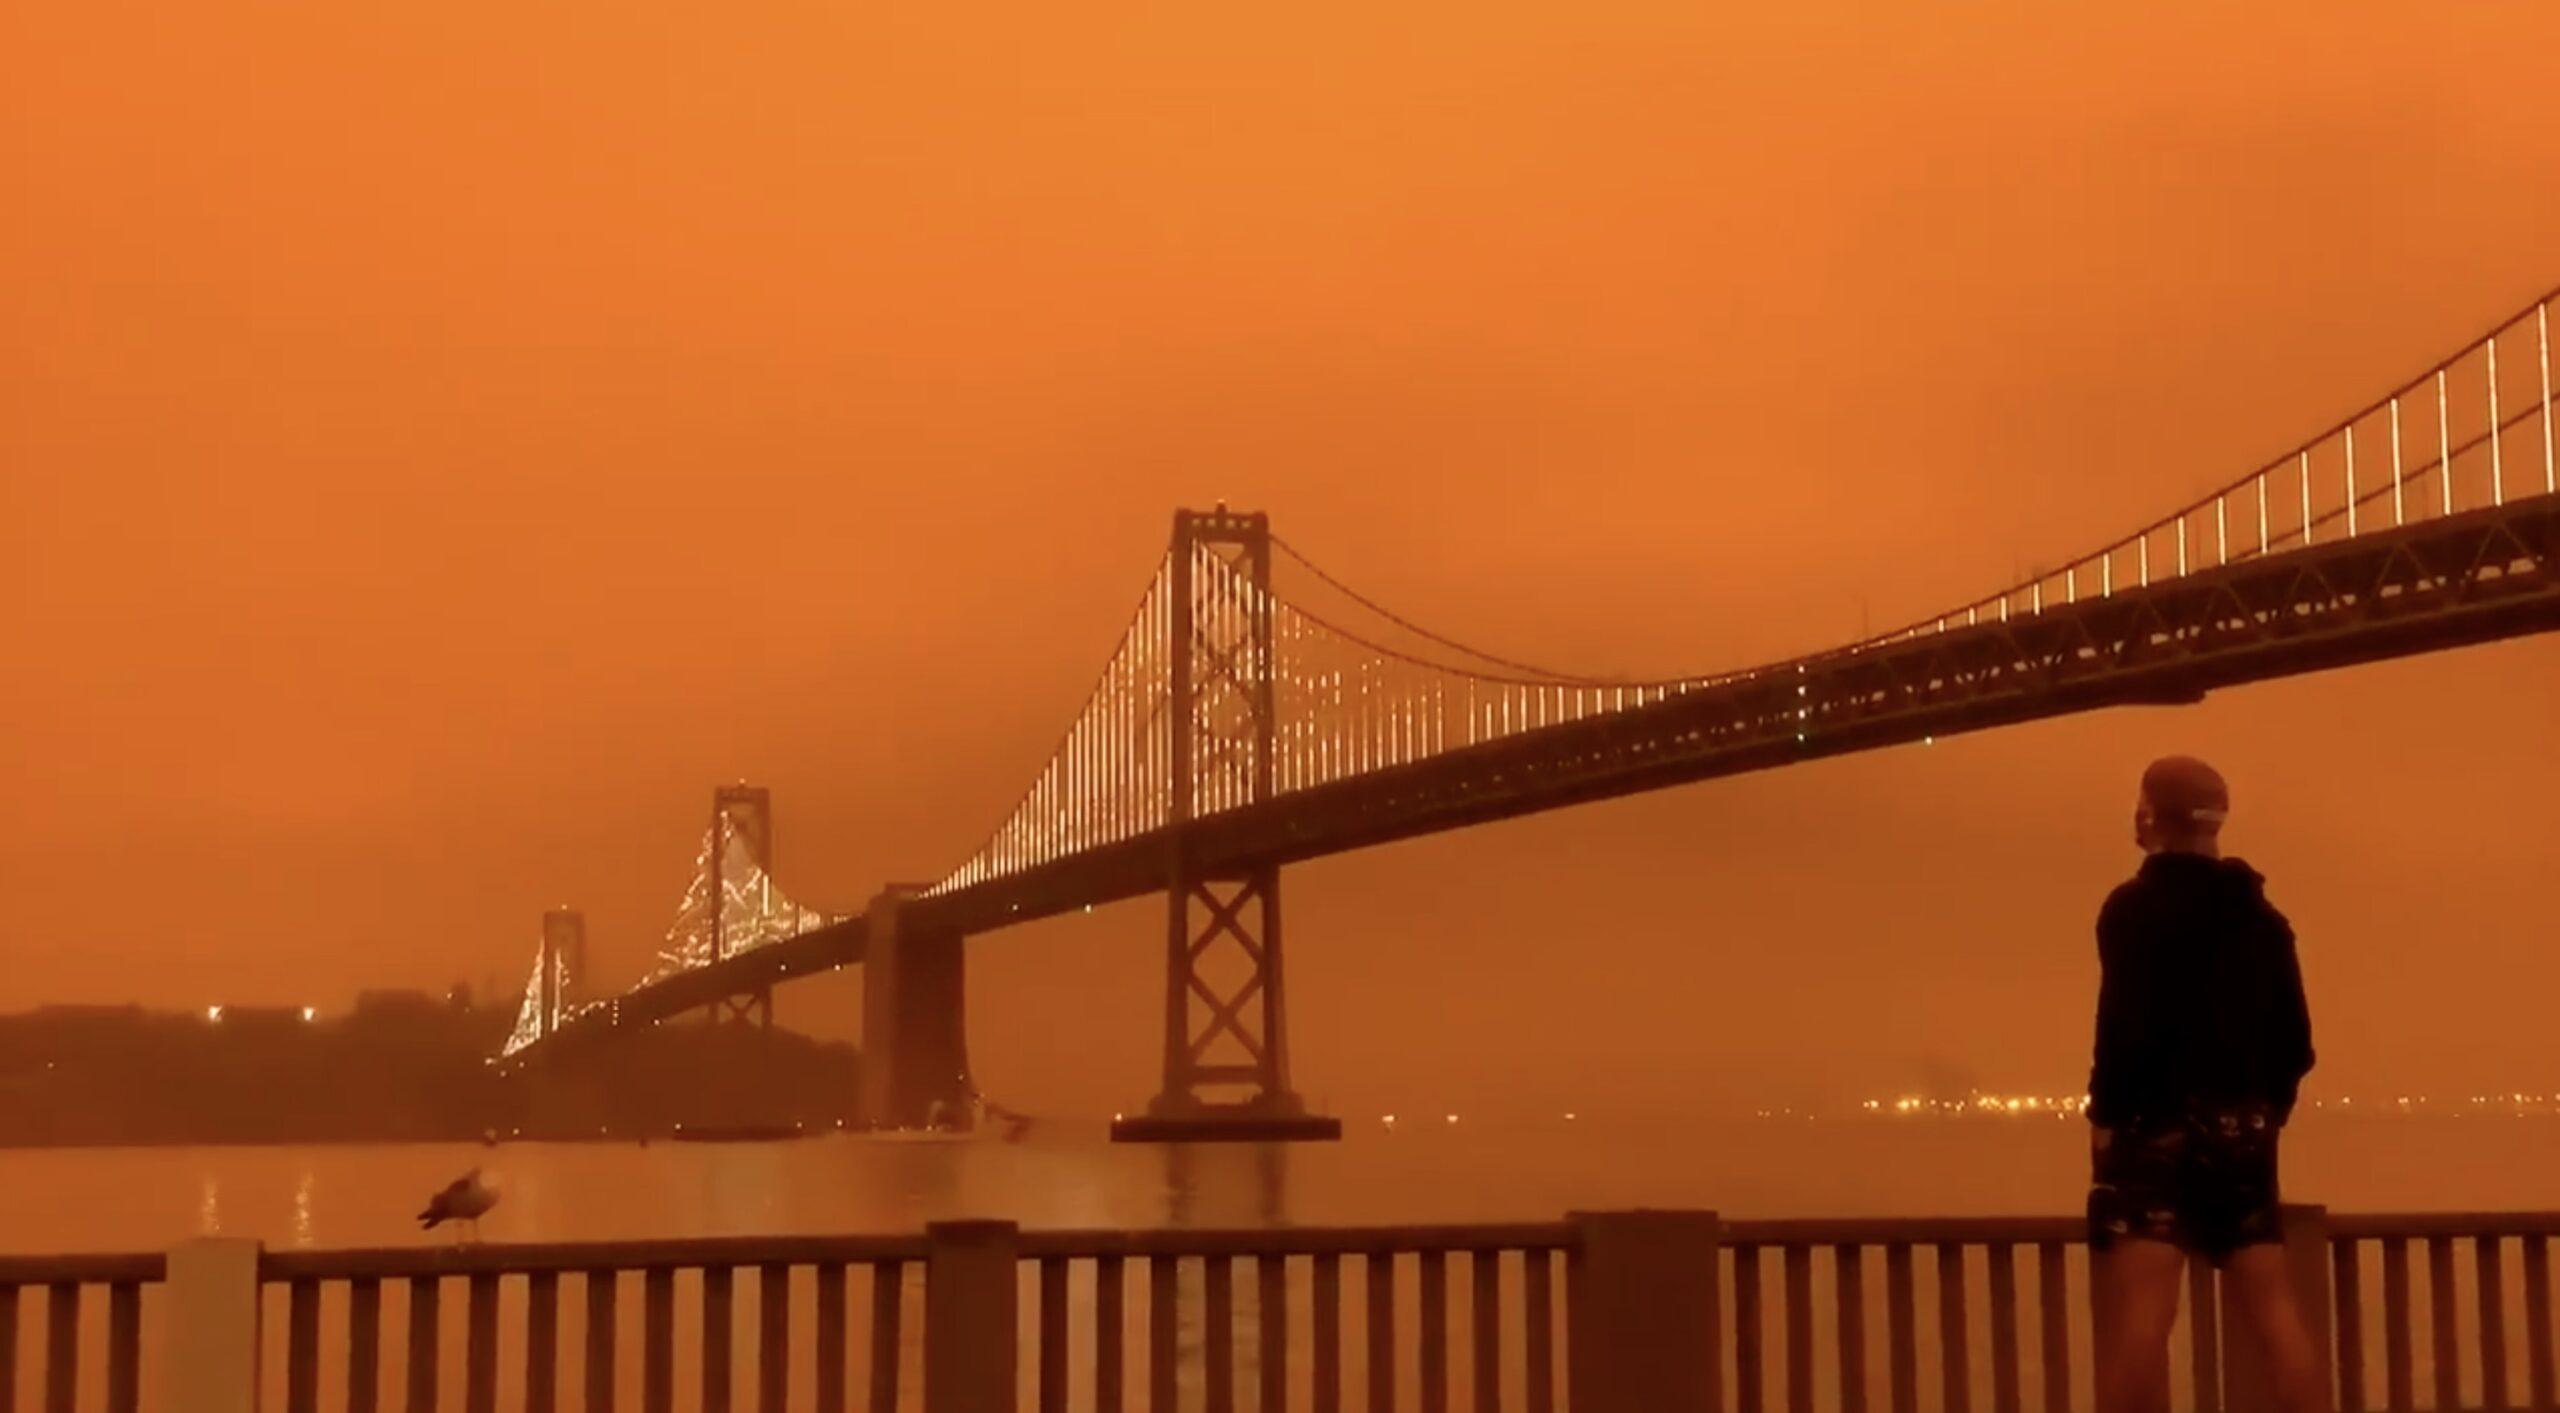 san fran orange sky